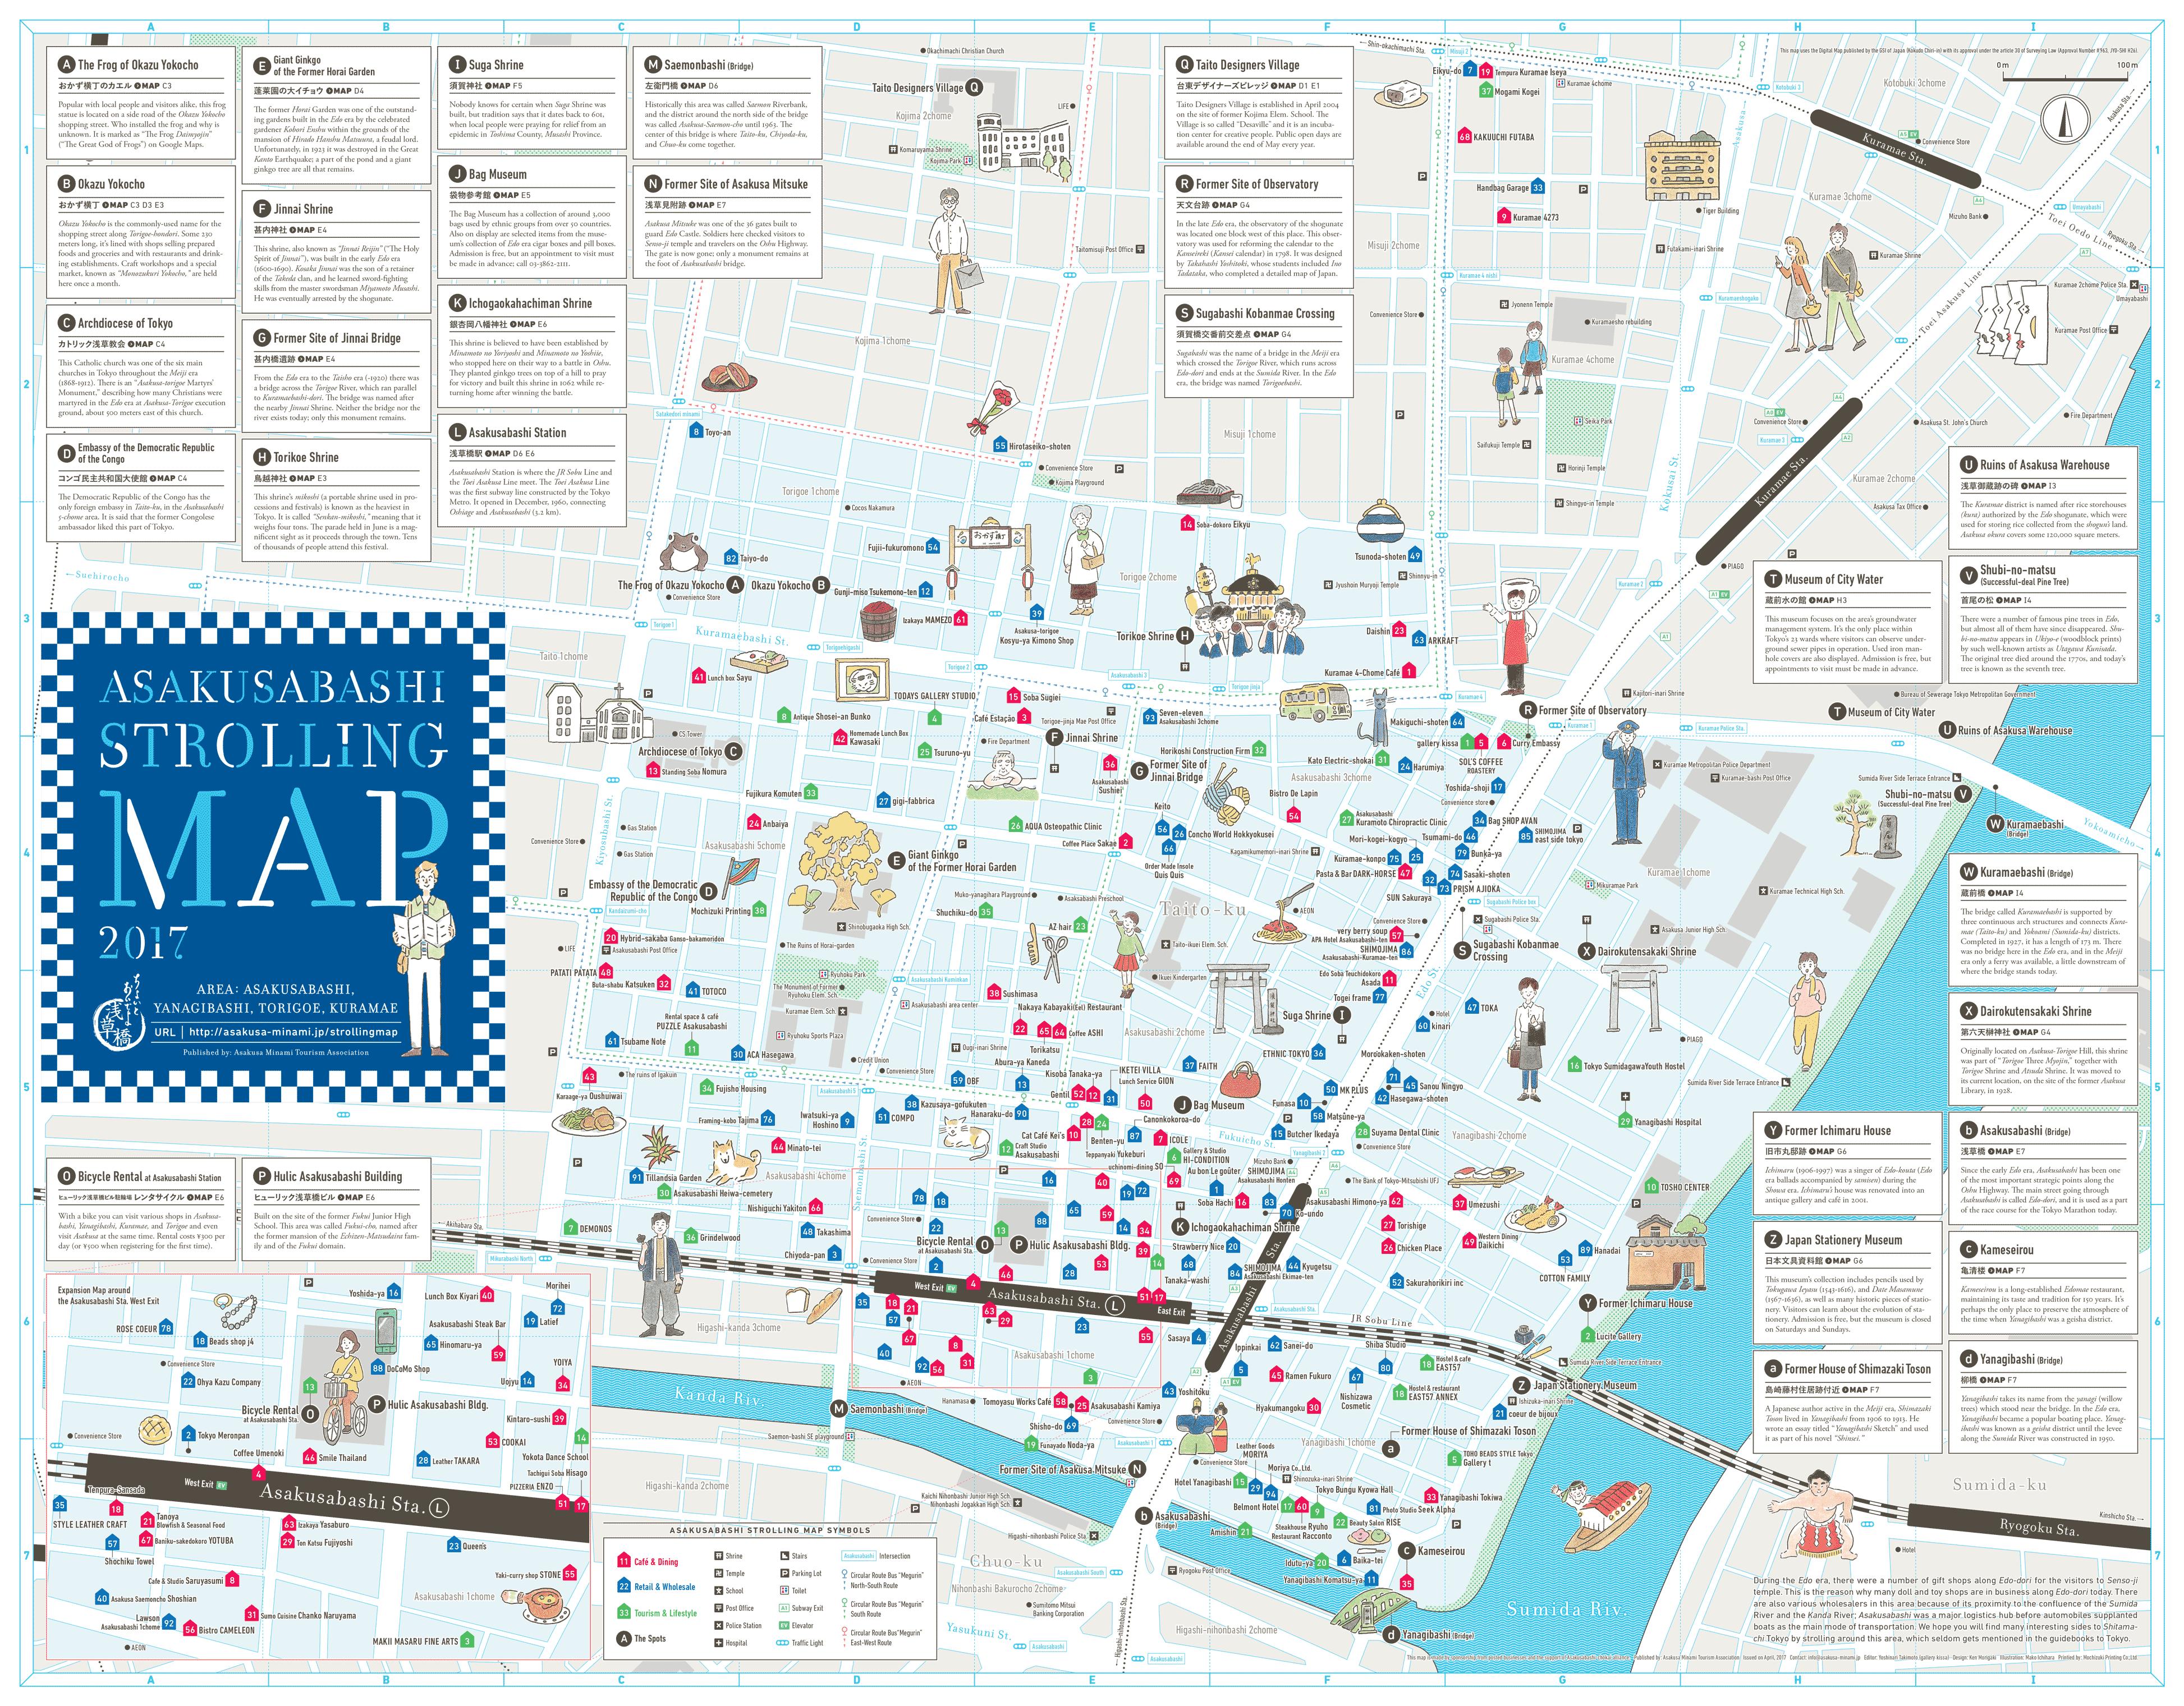 abm_eng_map_170405_2